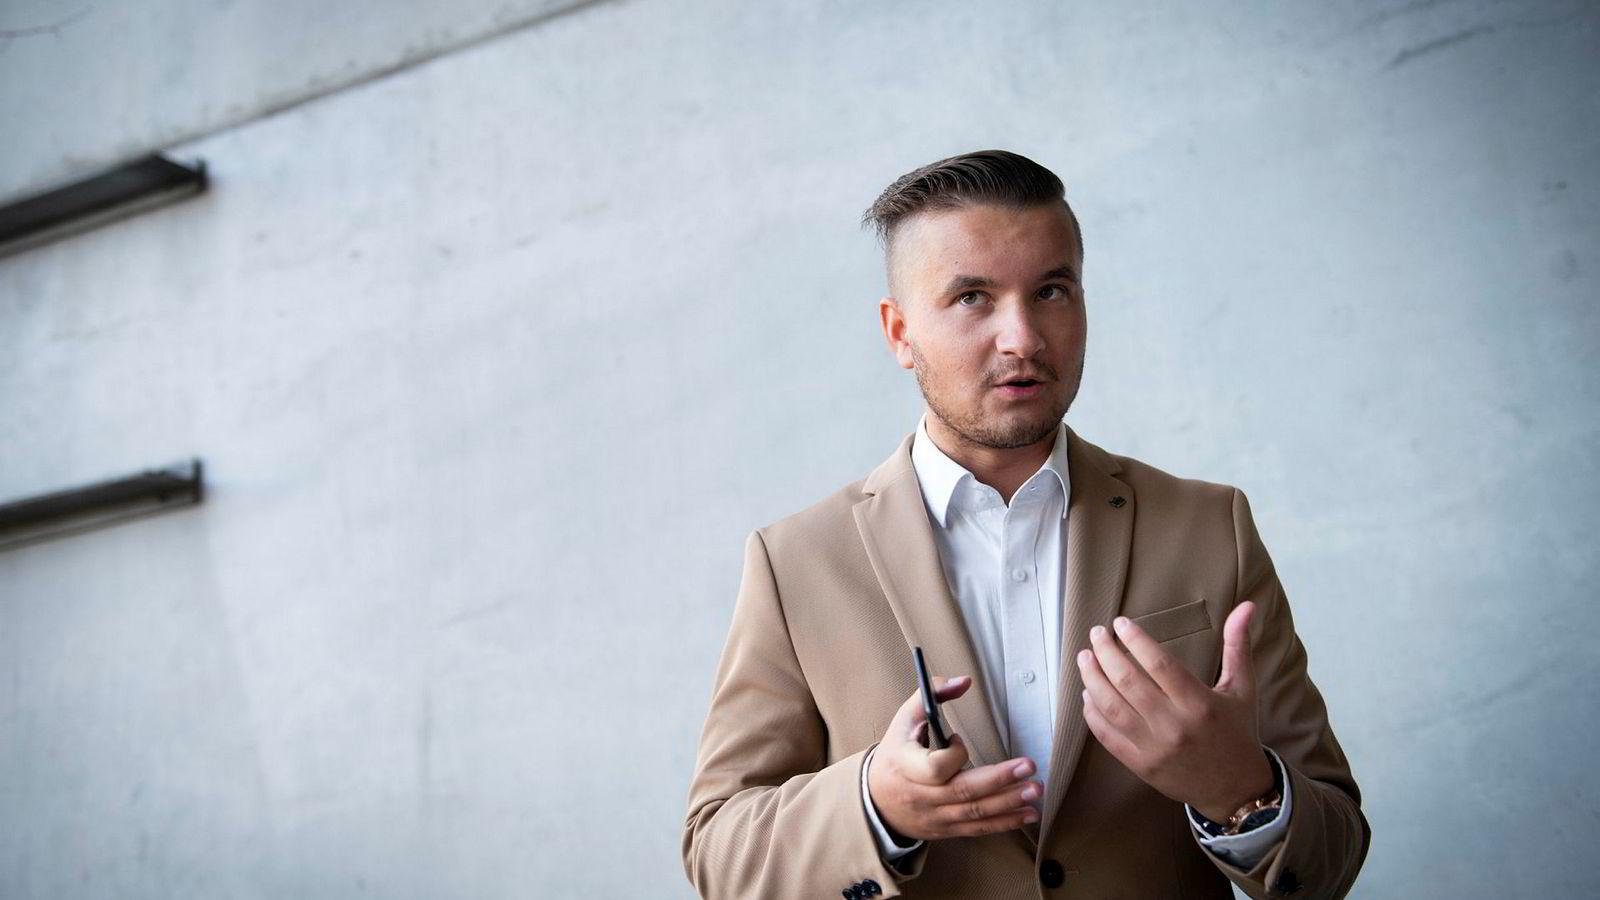 Leder i NEF Ung Anders Kløvning mener dagens universitets- og høyskolelov er utdatert.